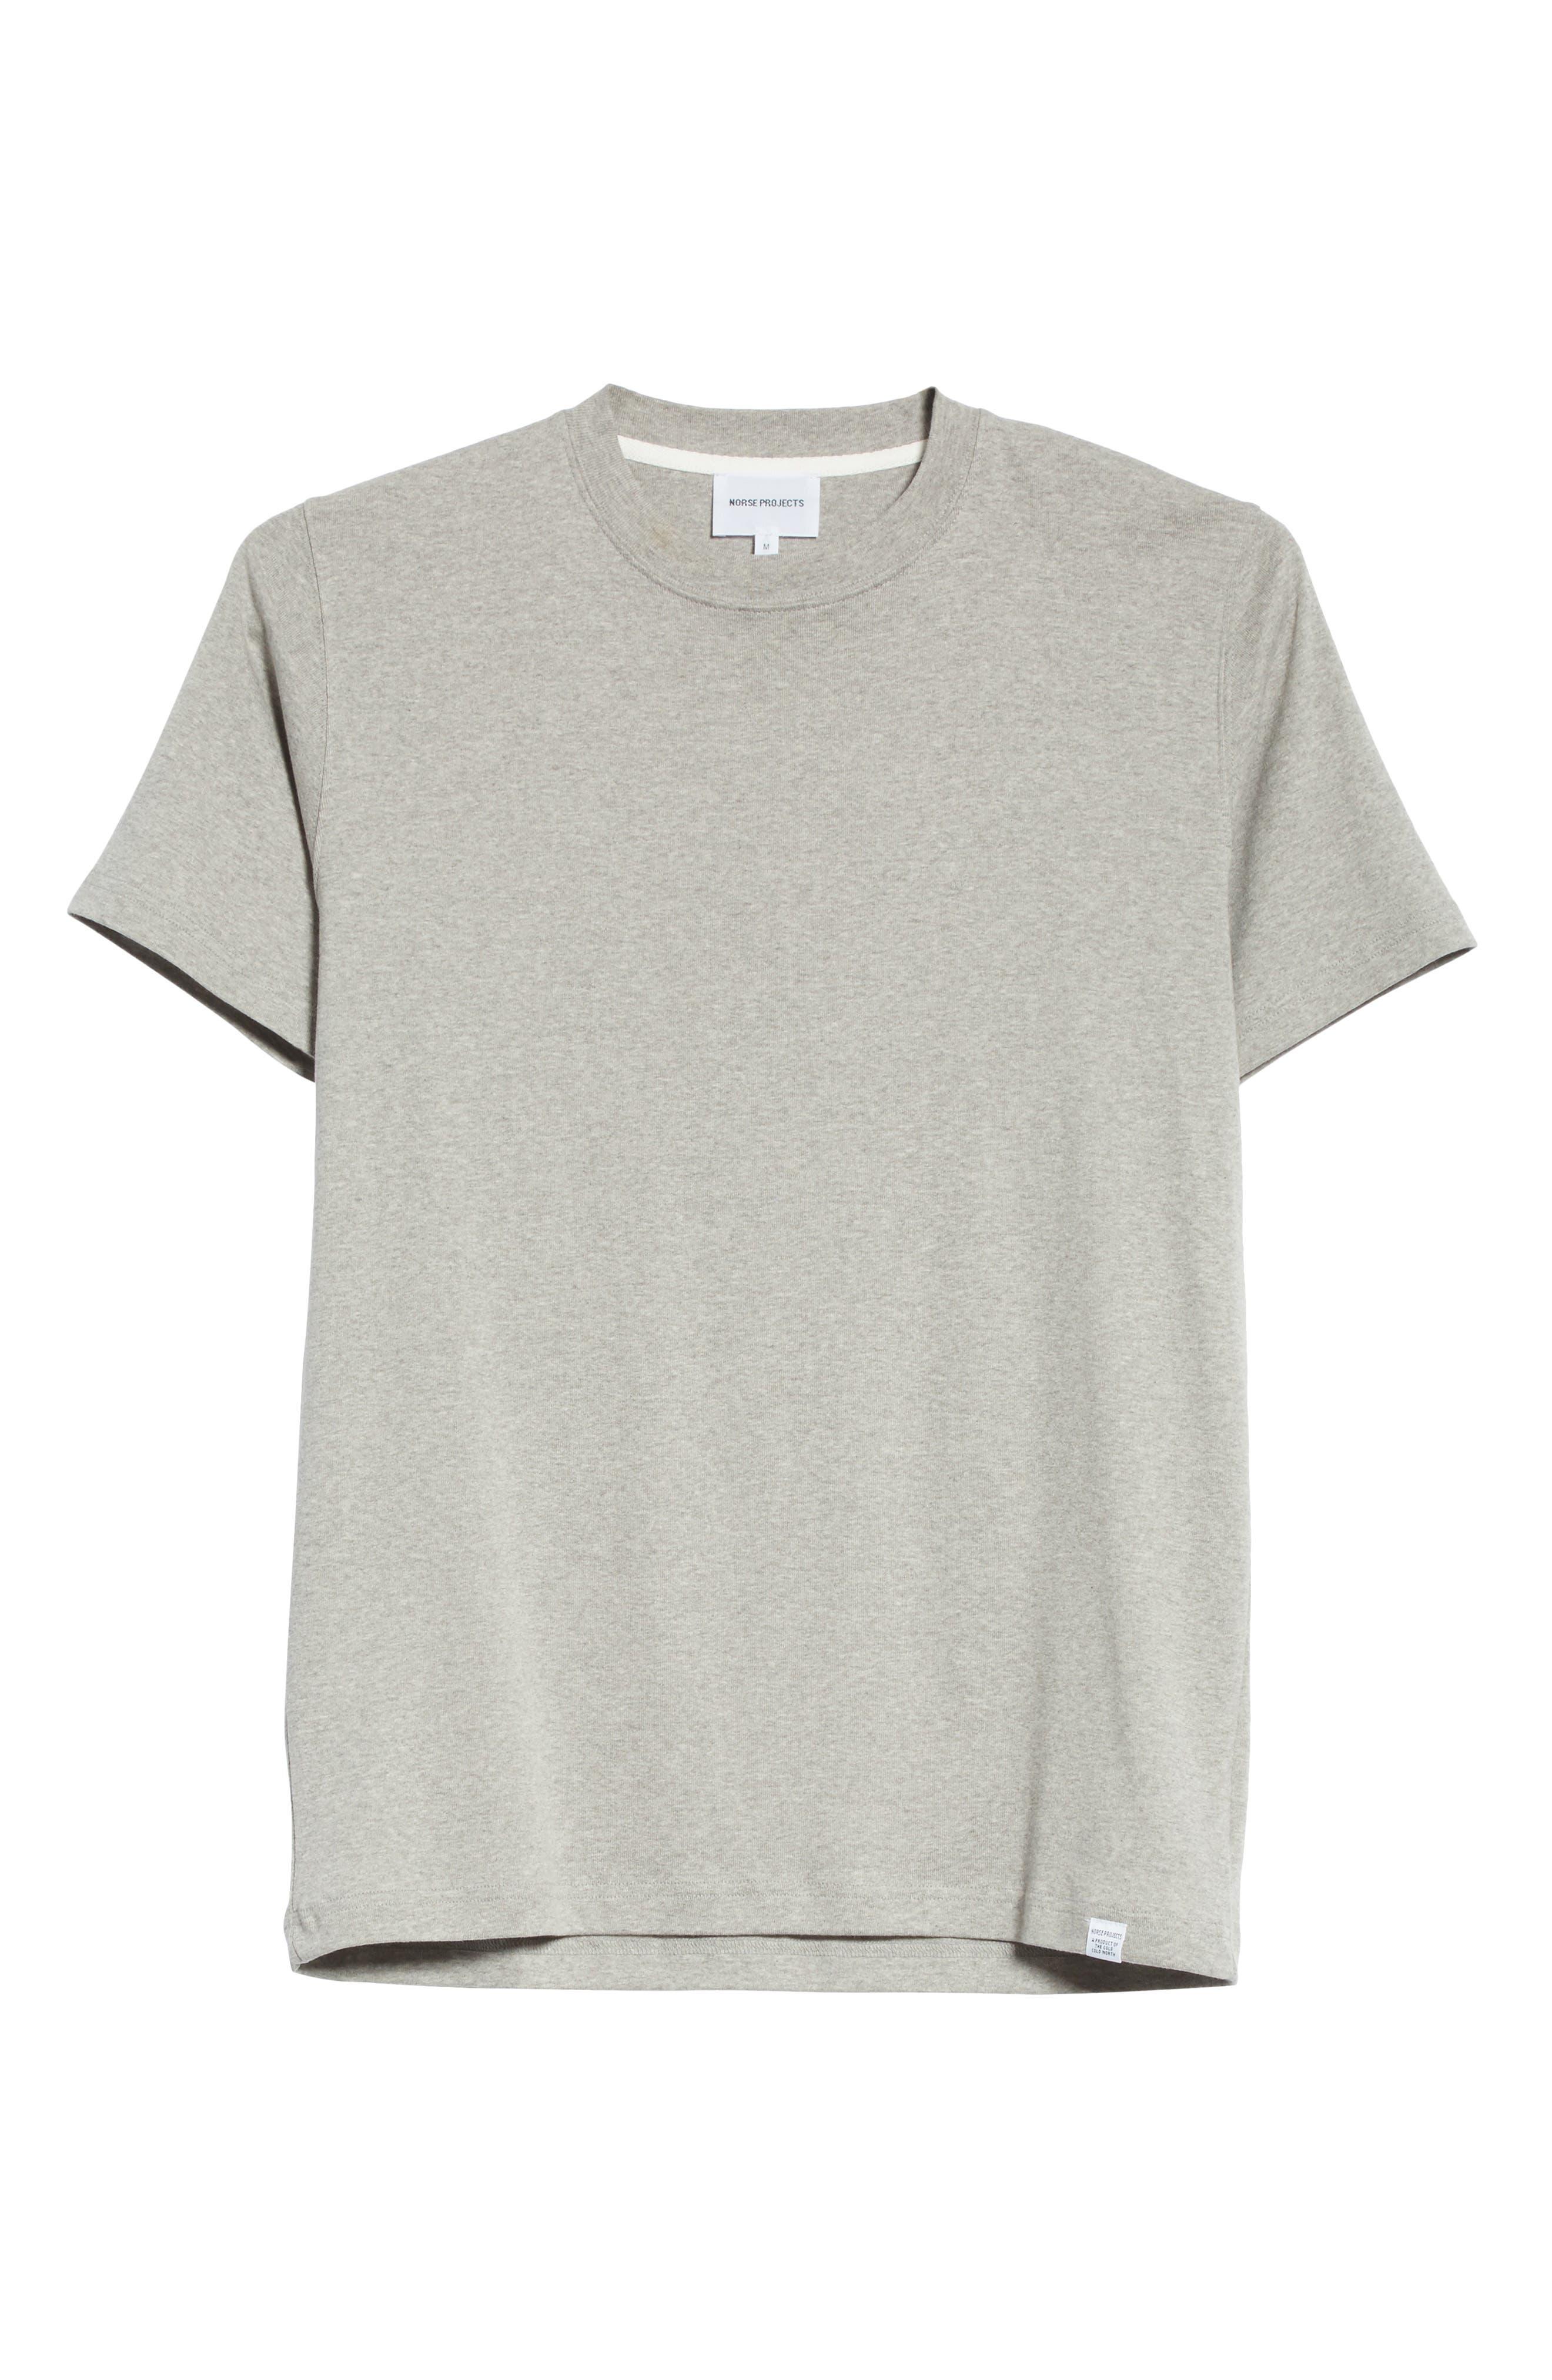 James T-Shirt,                             Alternate thumbnail 6, color,                             021